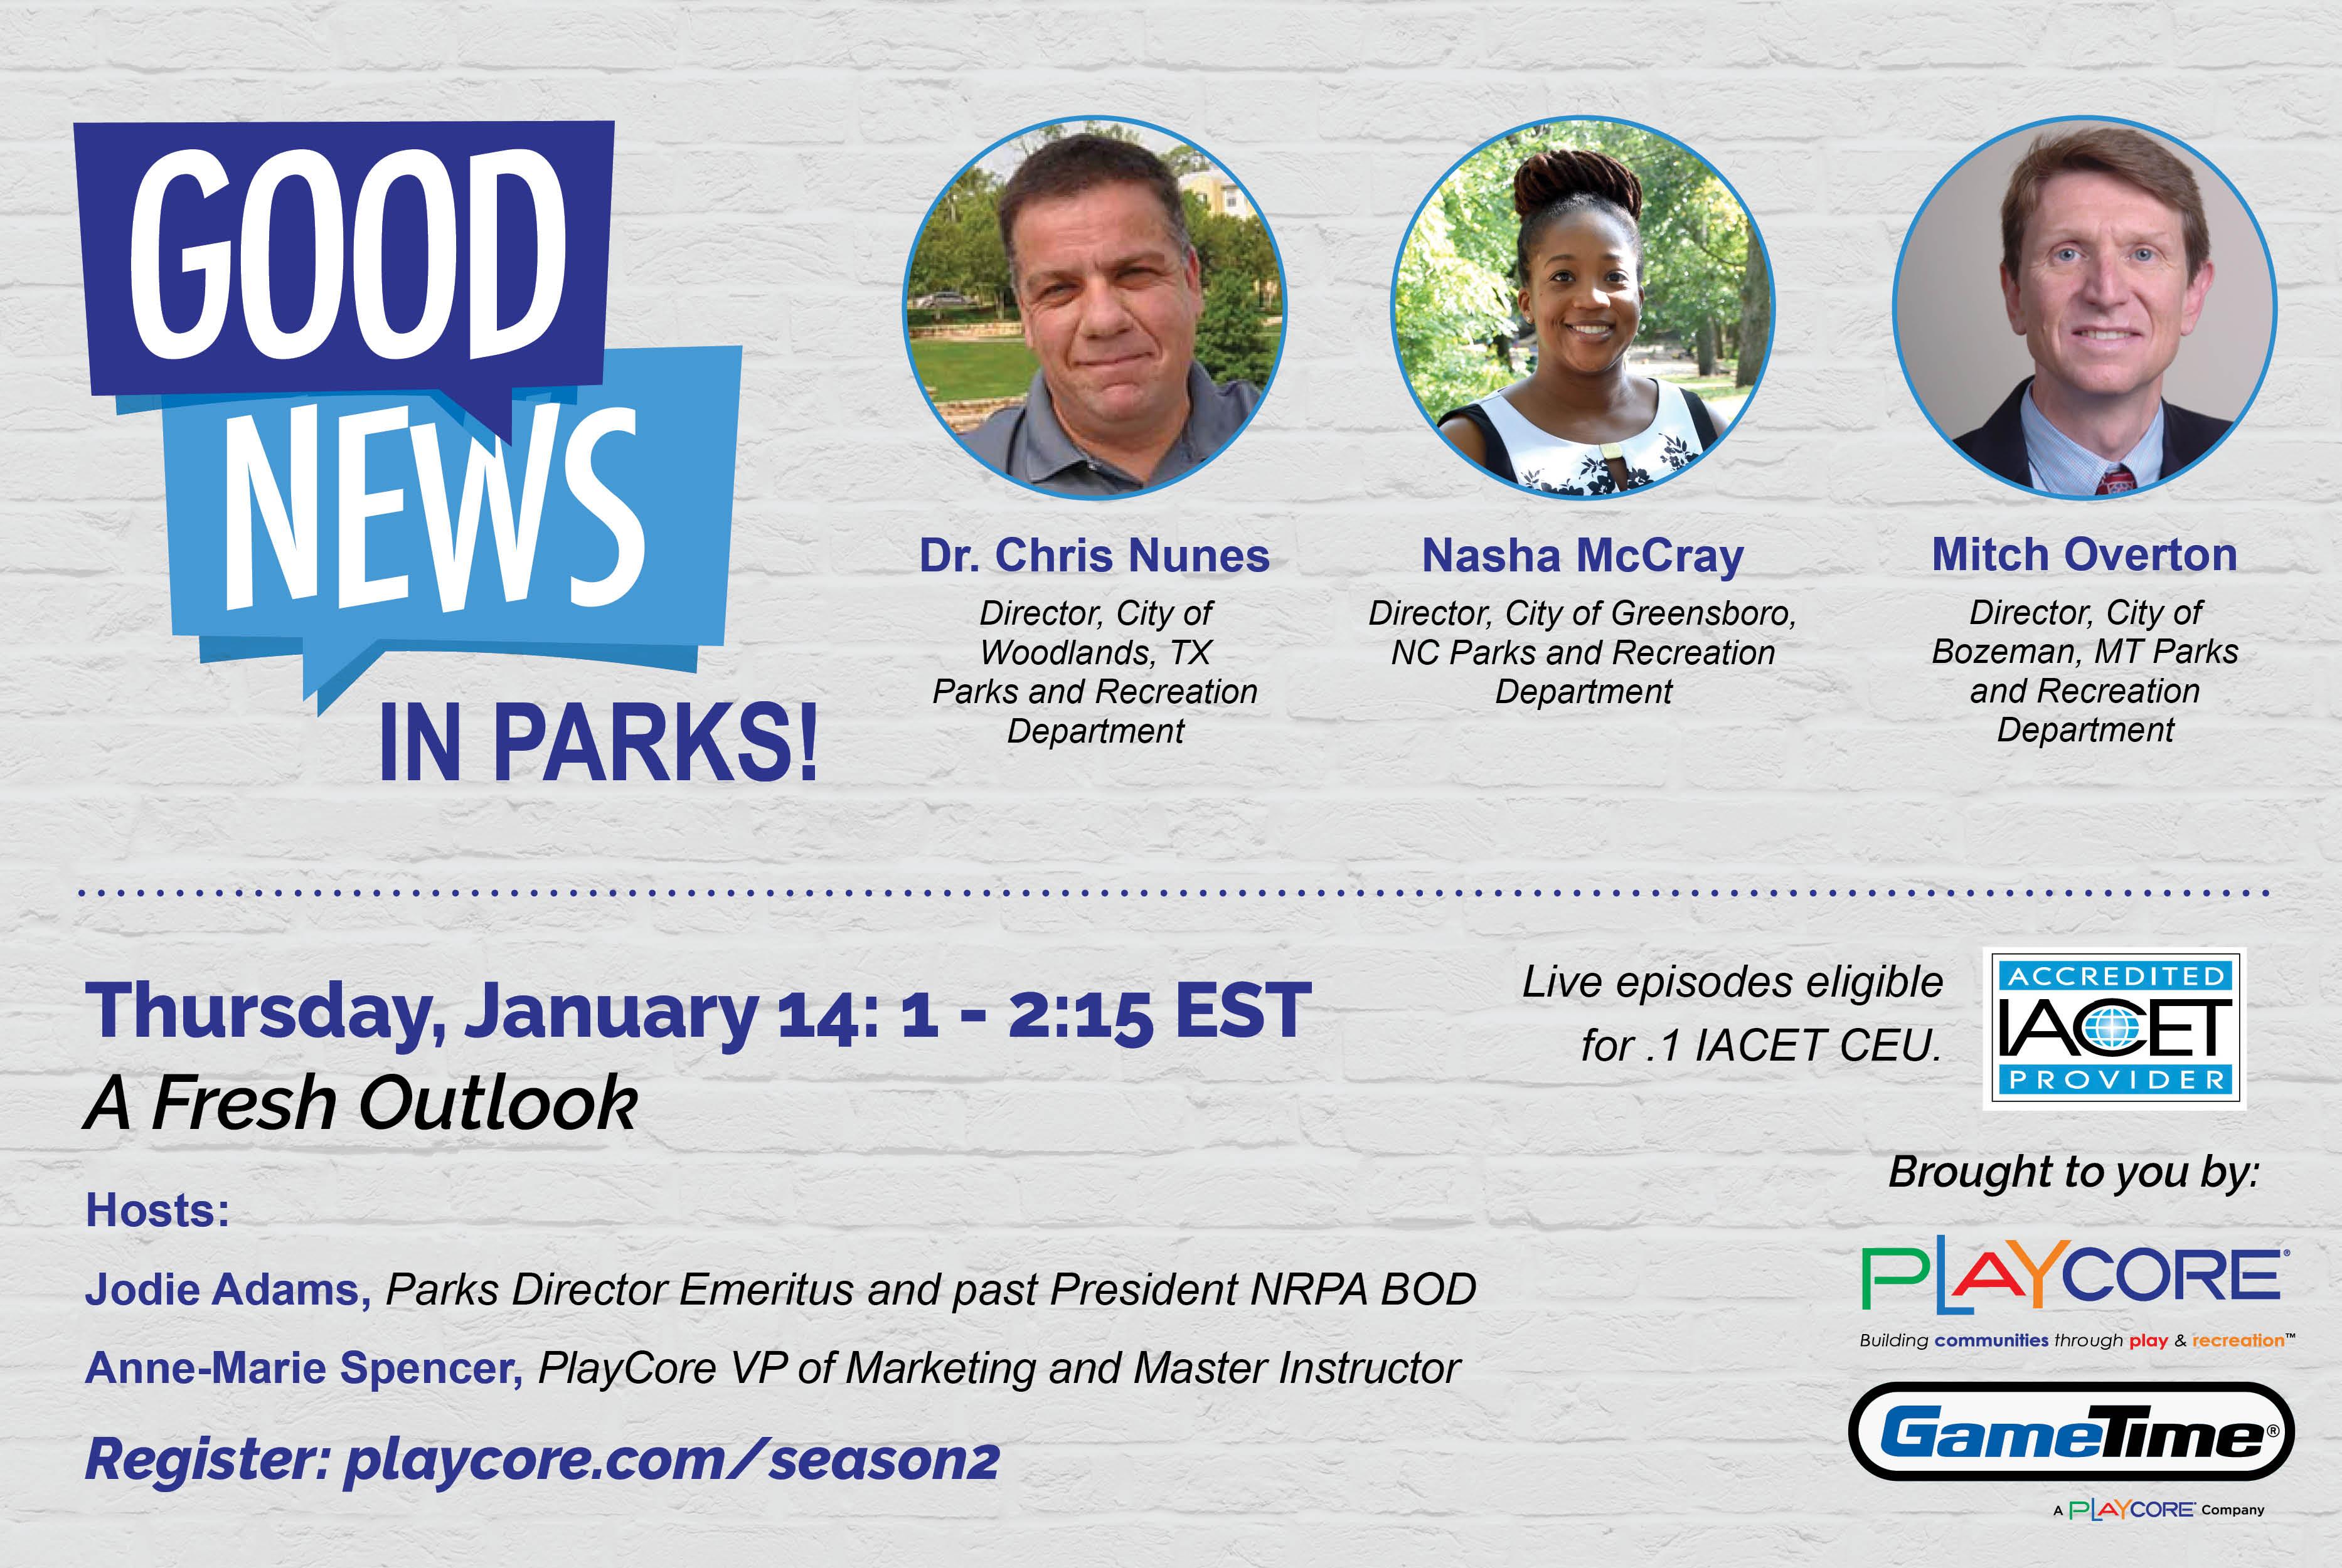 Good News in Parks - Season 2 - Banner Image - Episode 1